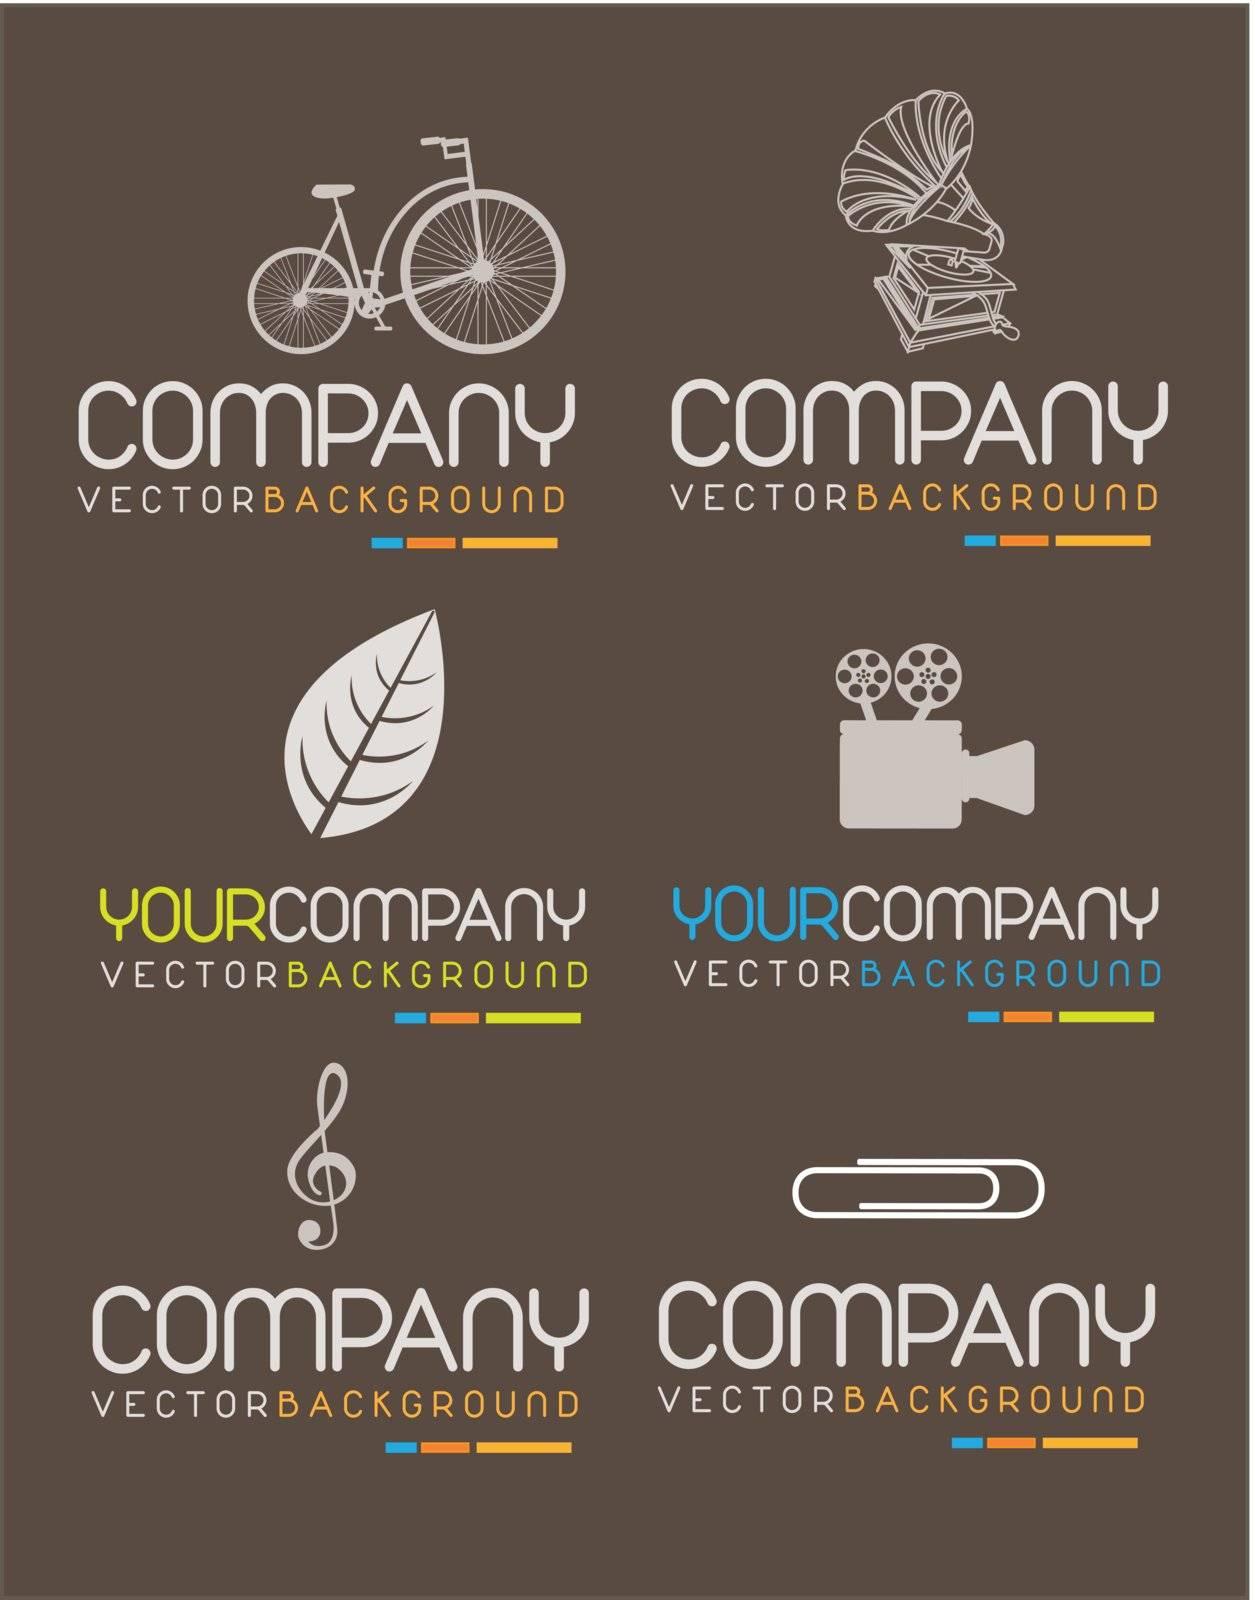 various symbols of company. Vector illustration